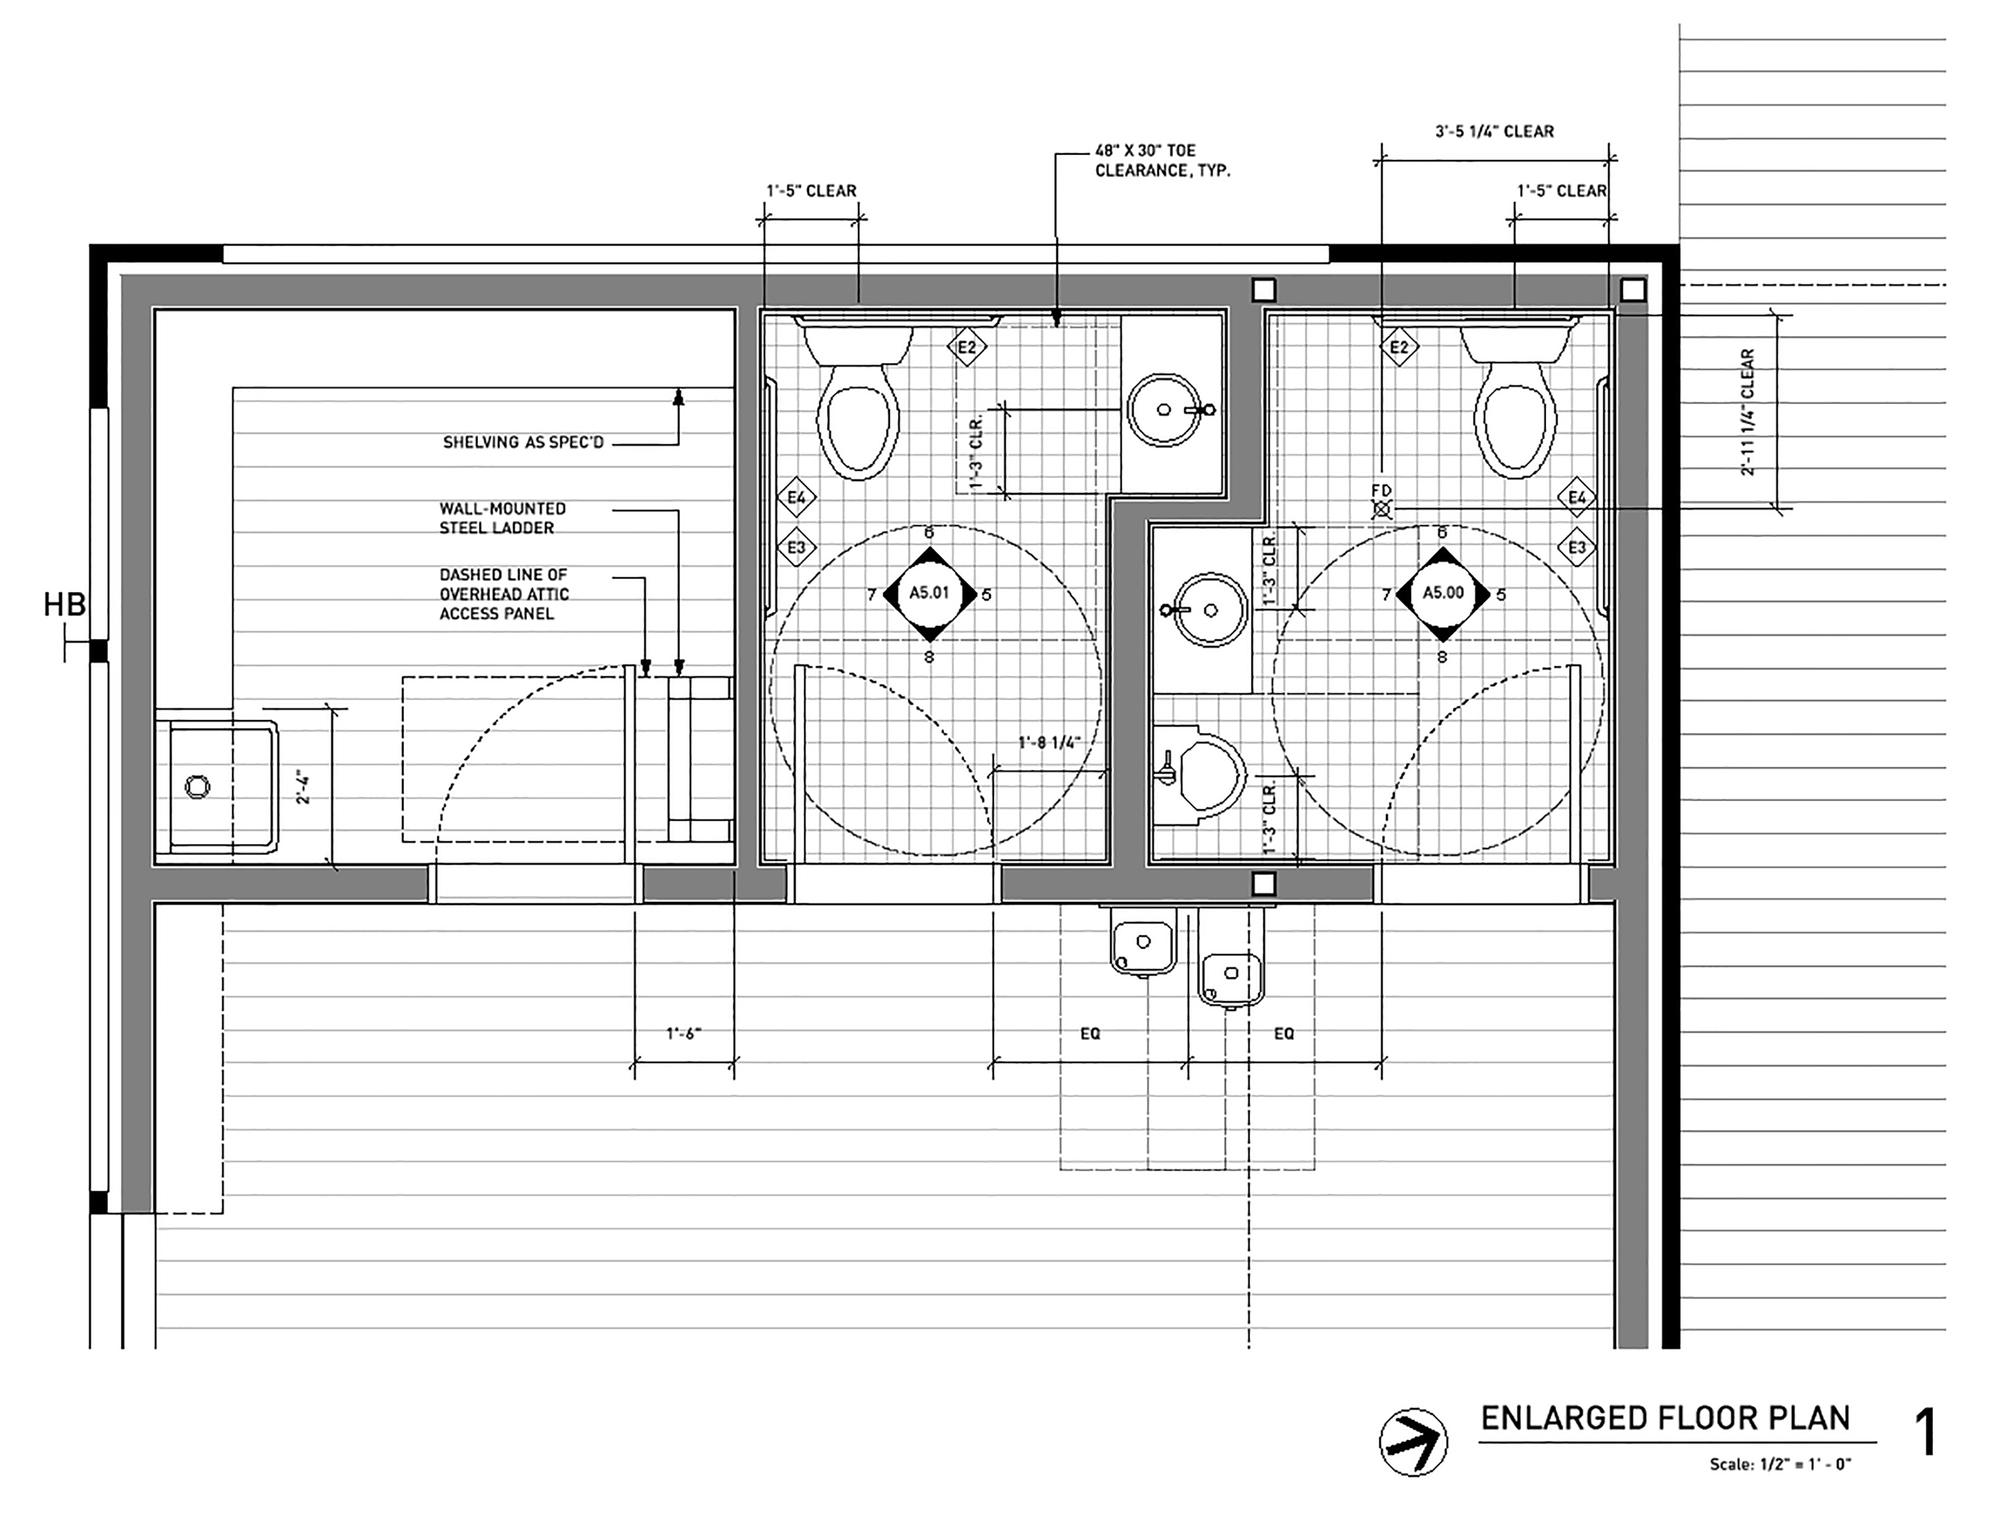 Gallery Of Khabele Elementary Expansion Derrington Building Studio 43